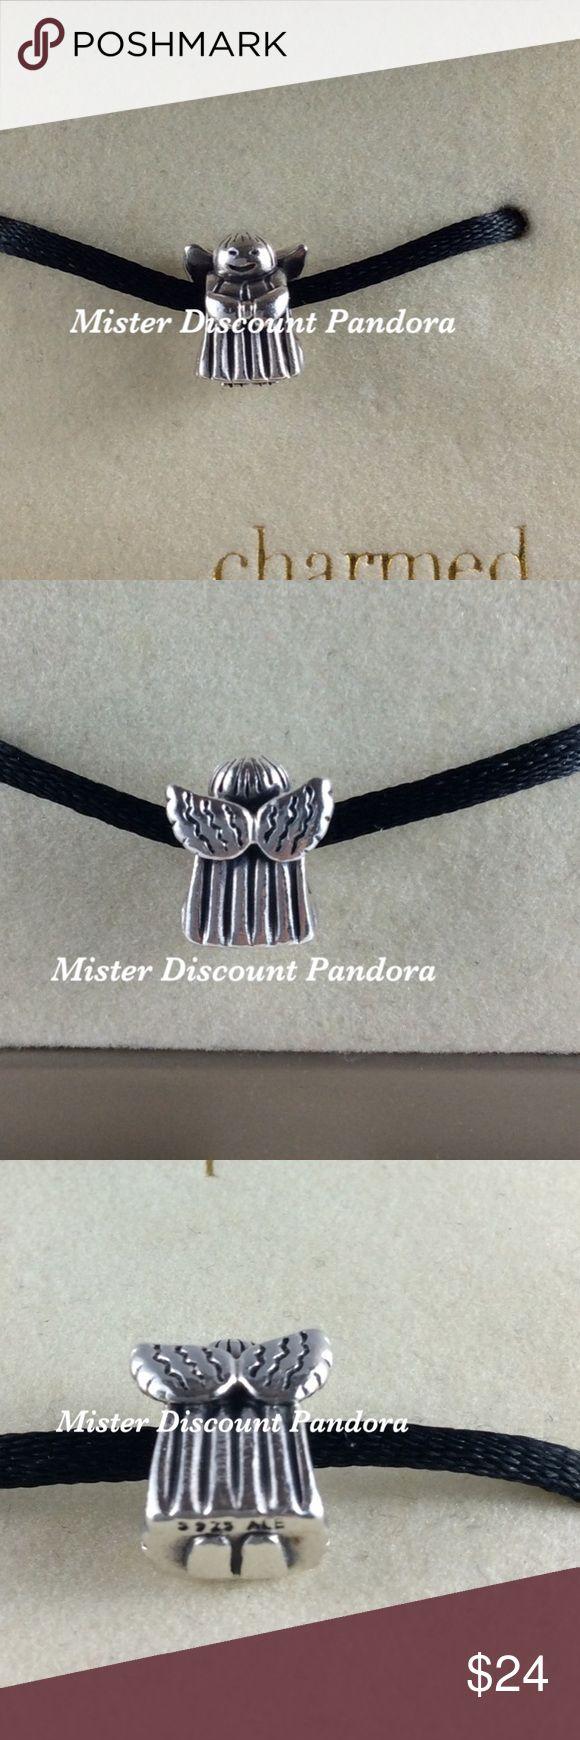 Pandora Angel Of Hope Charm Authentic Pandora Angel Of Hope Charm #790337.  Signature markings Ale/S925  Condition: Excellent Pandora Jewelry Bracelets